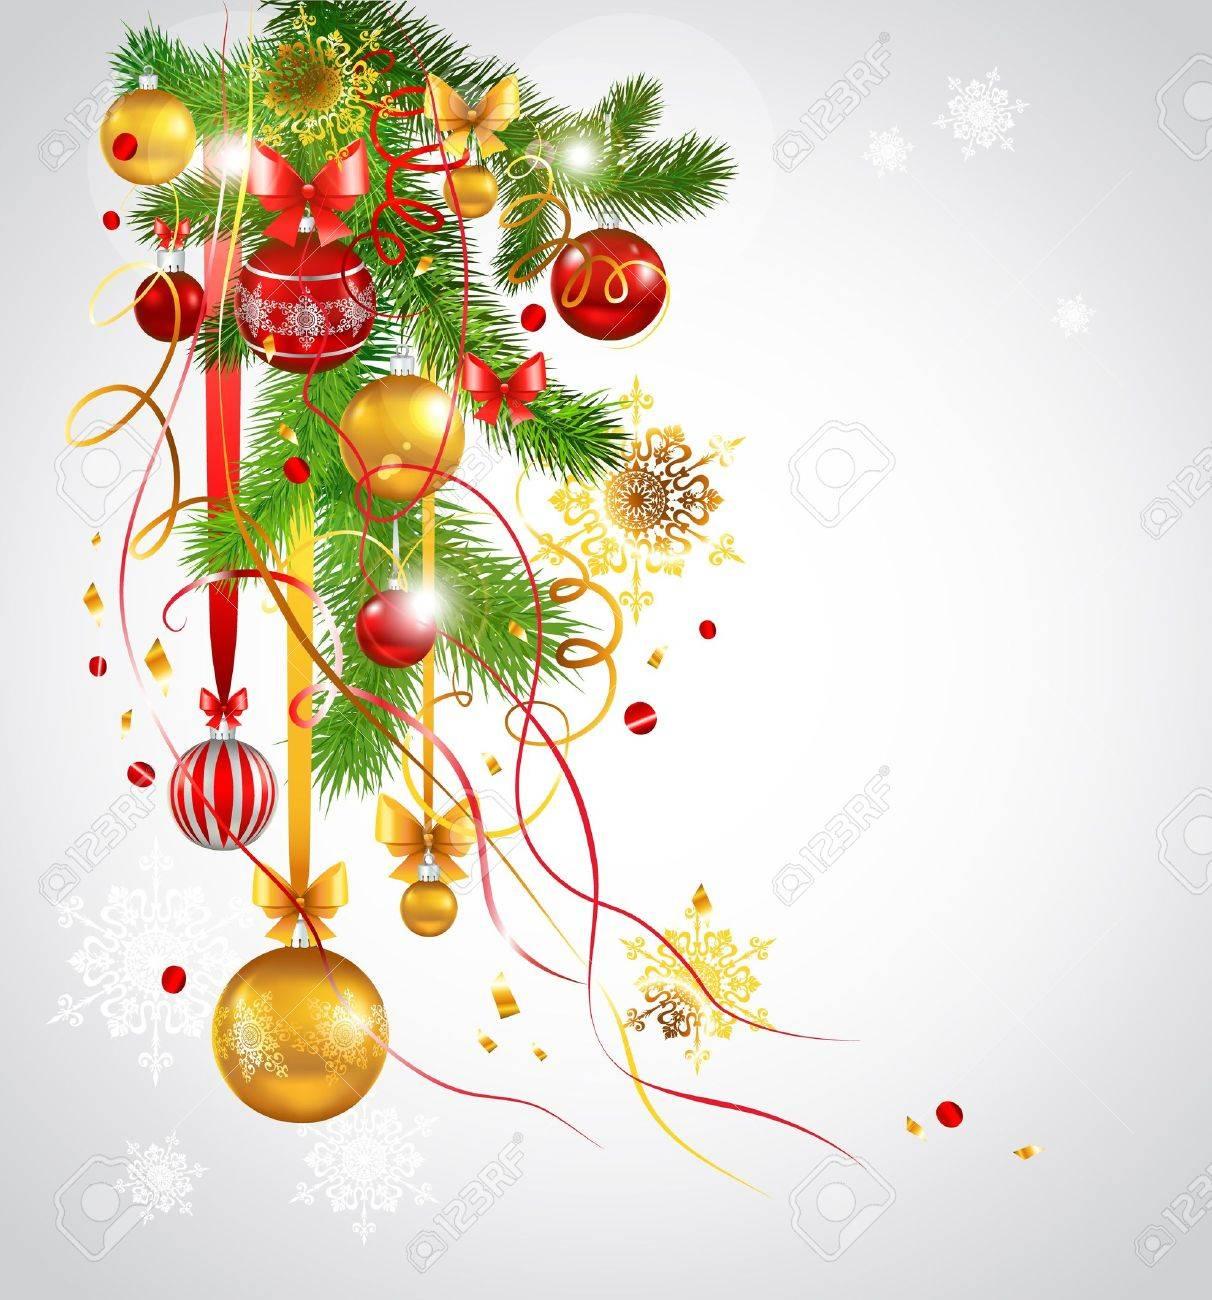 Beautiful decorated Christmas fir tree. Eps 10 Stock Vector - 10966392